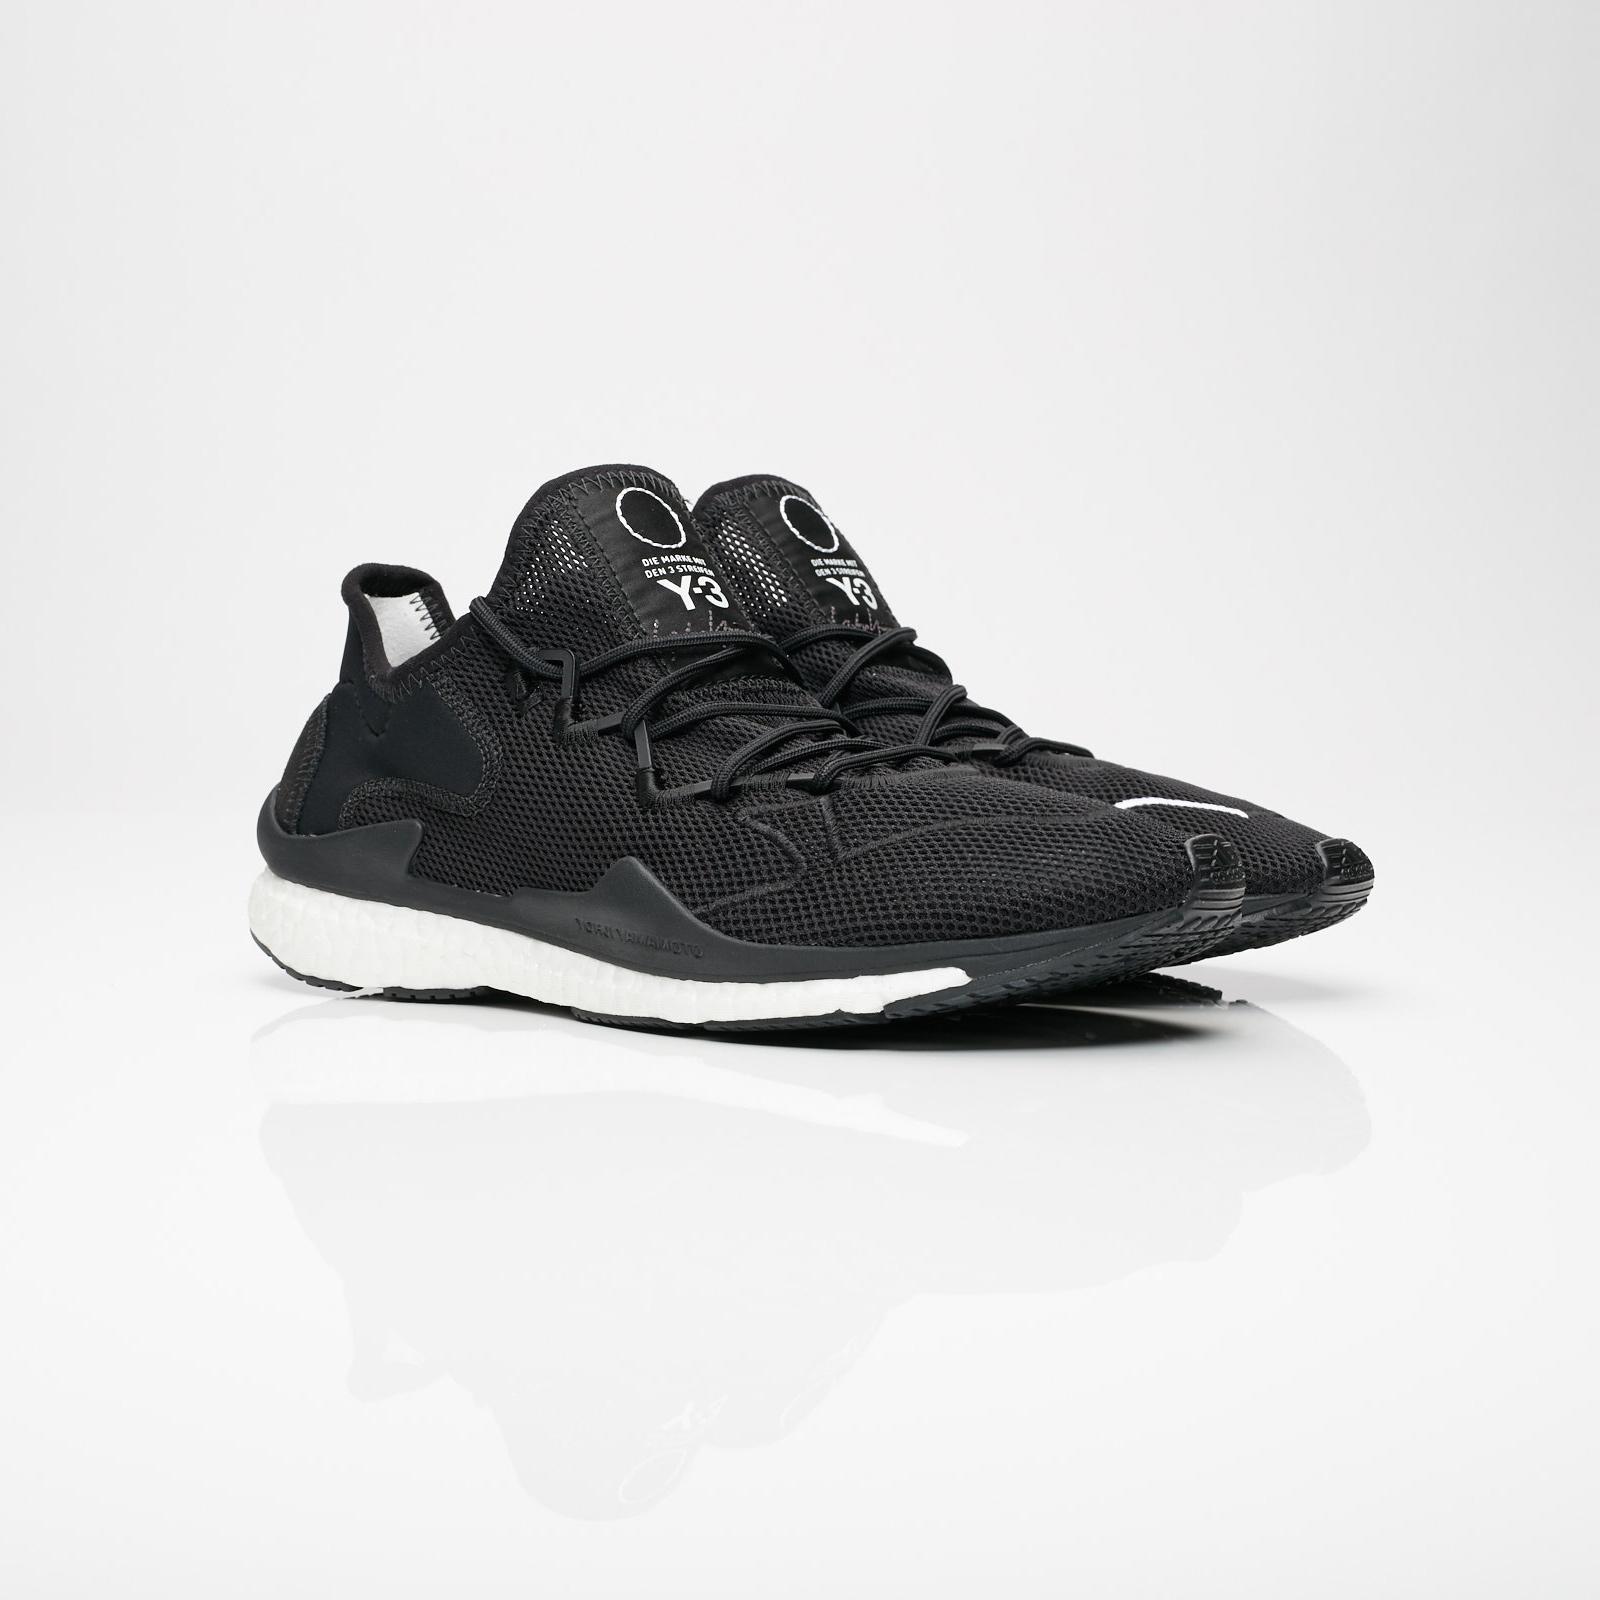 c1b674182b7e adidas Y-3 Adizero Runner - D97837 - Sneakersnstuff